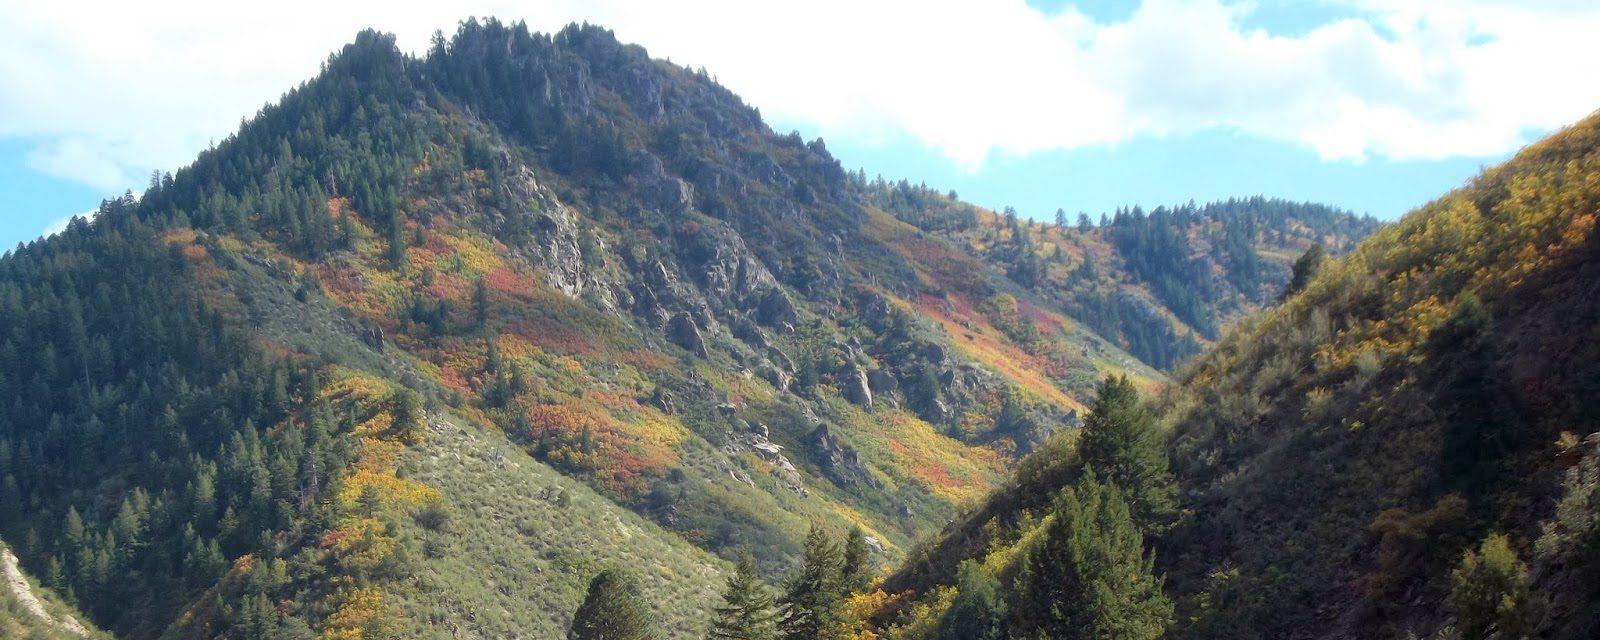 Autumn leaves in Waterton Canyon walking path